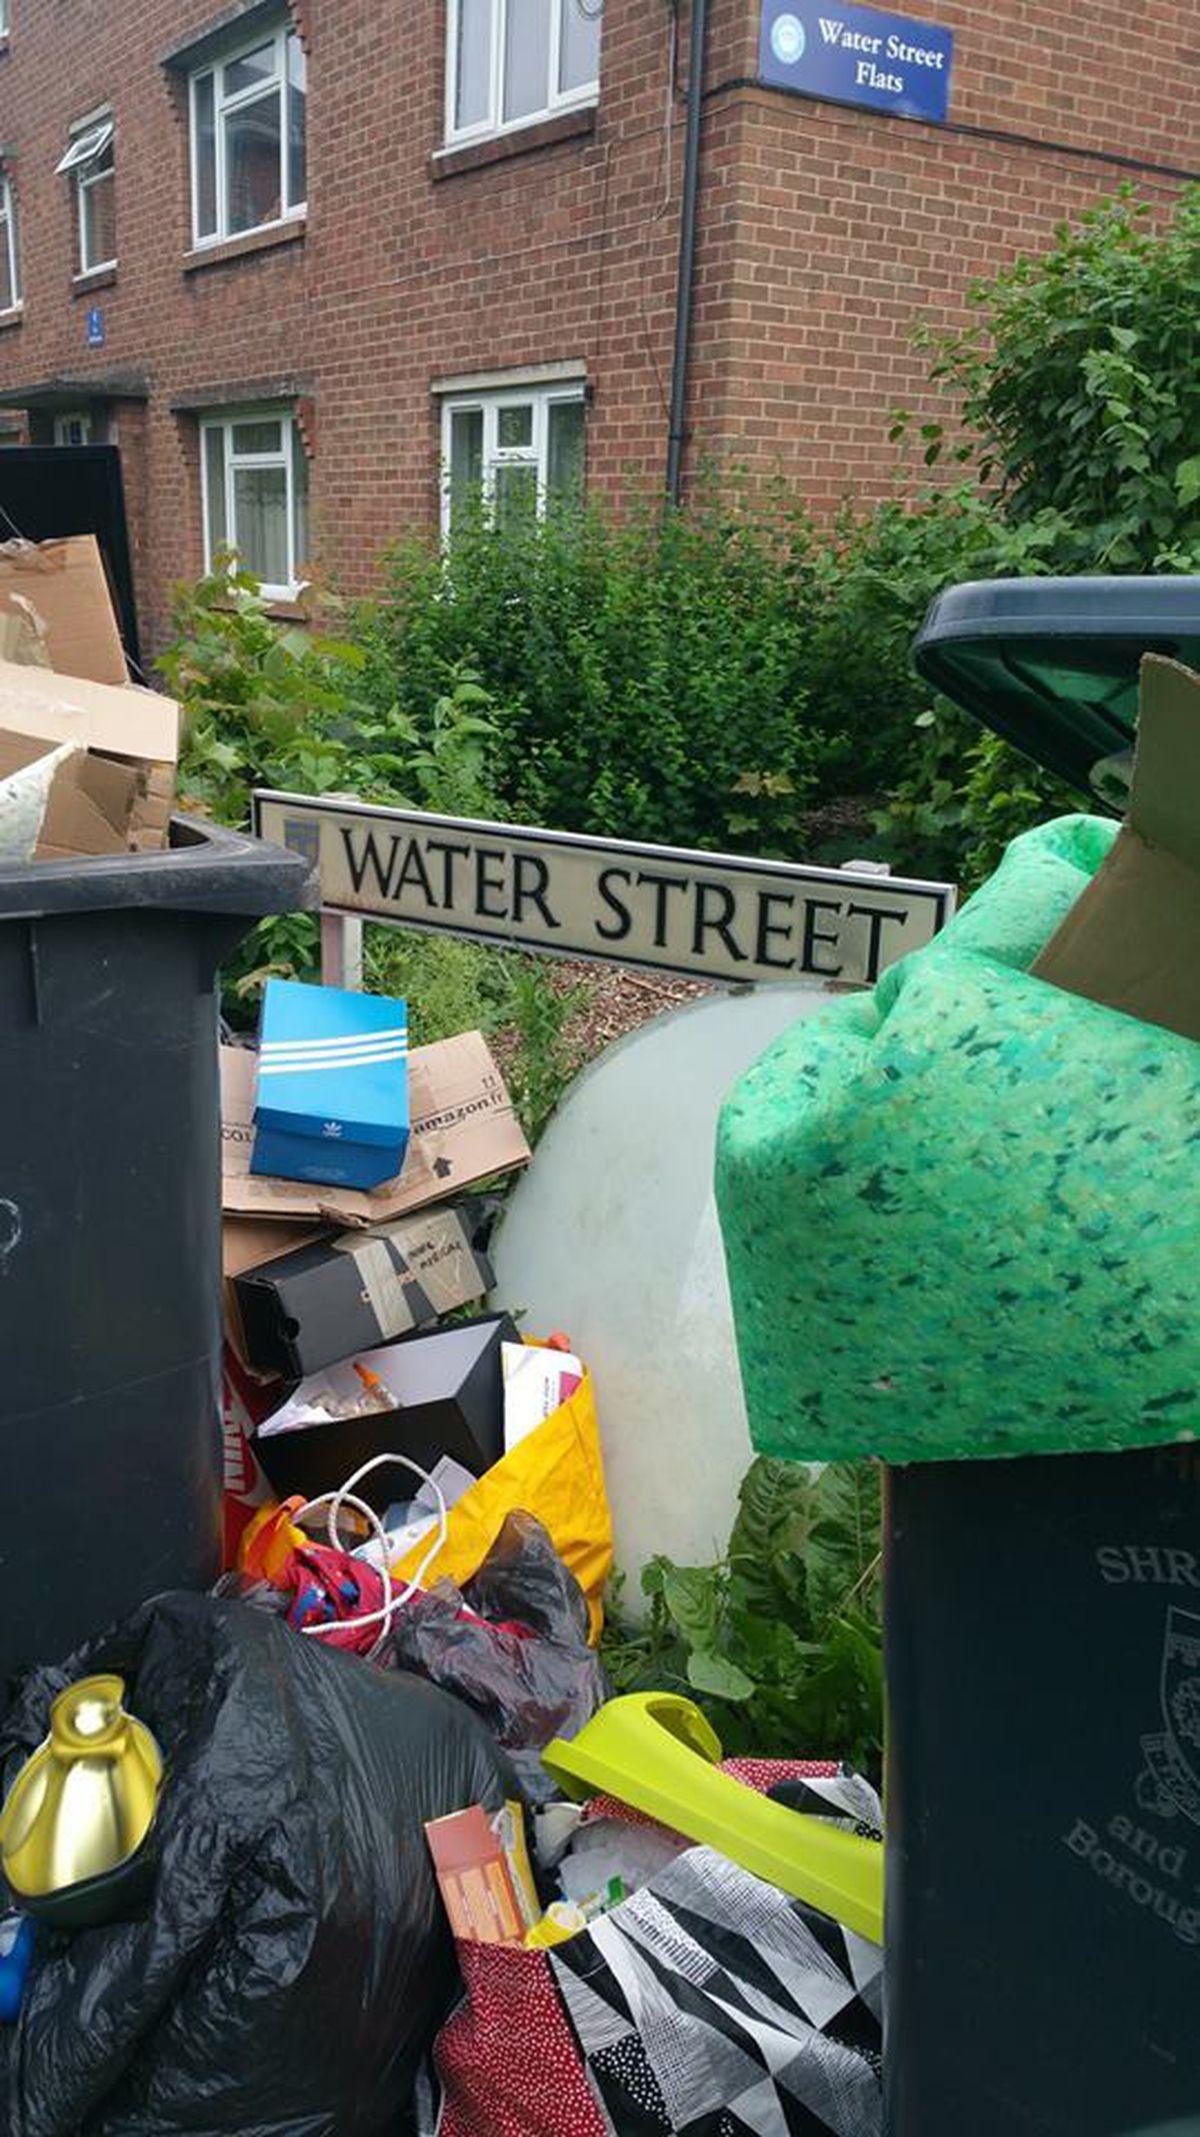 Water Street in Shrewsbury